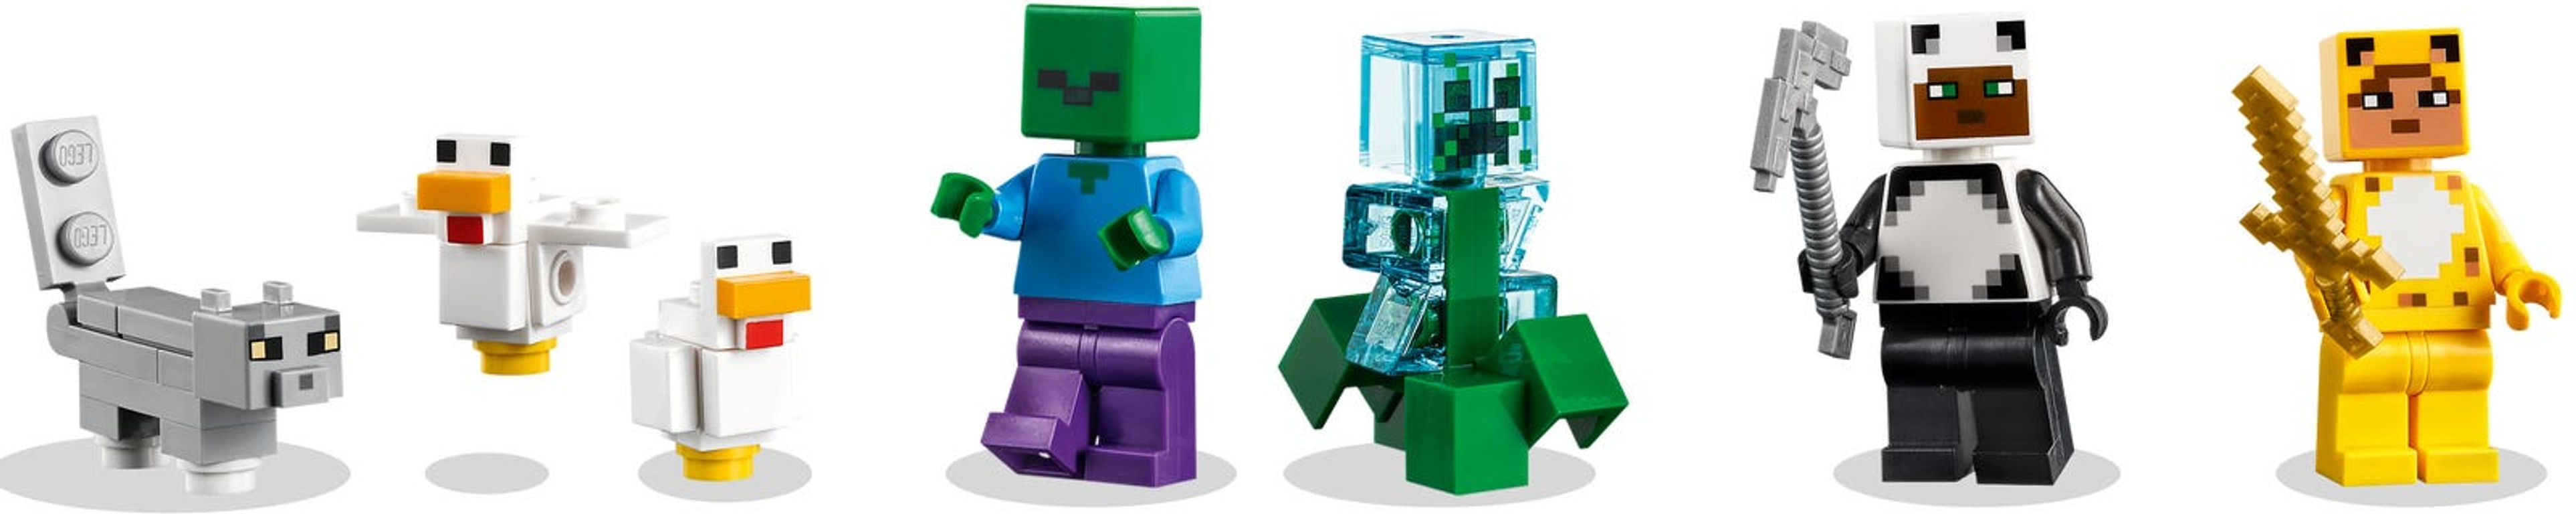 LEGO® Minecraft The Modern Treehouse minifigures